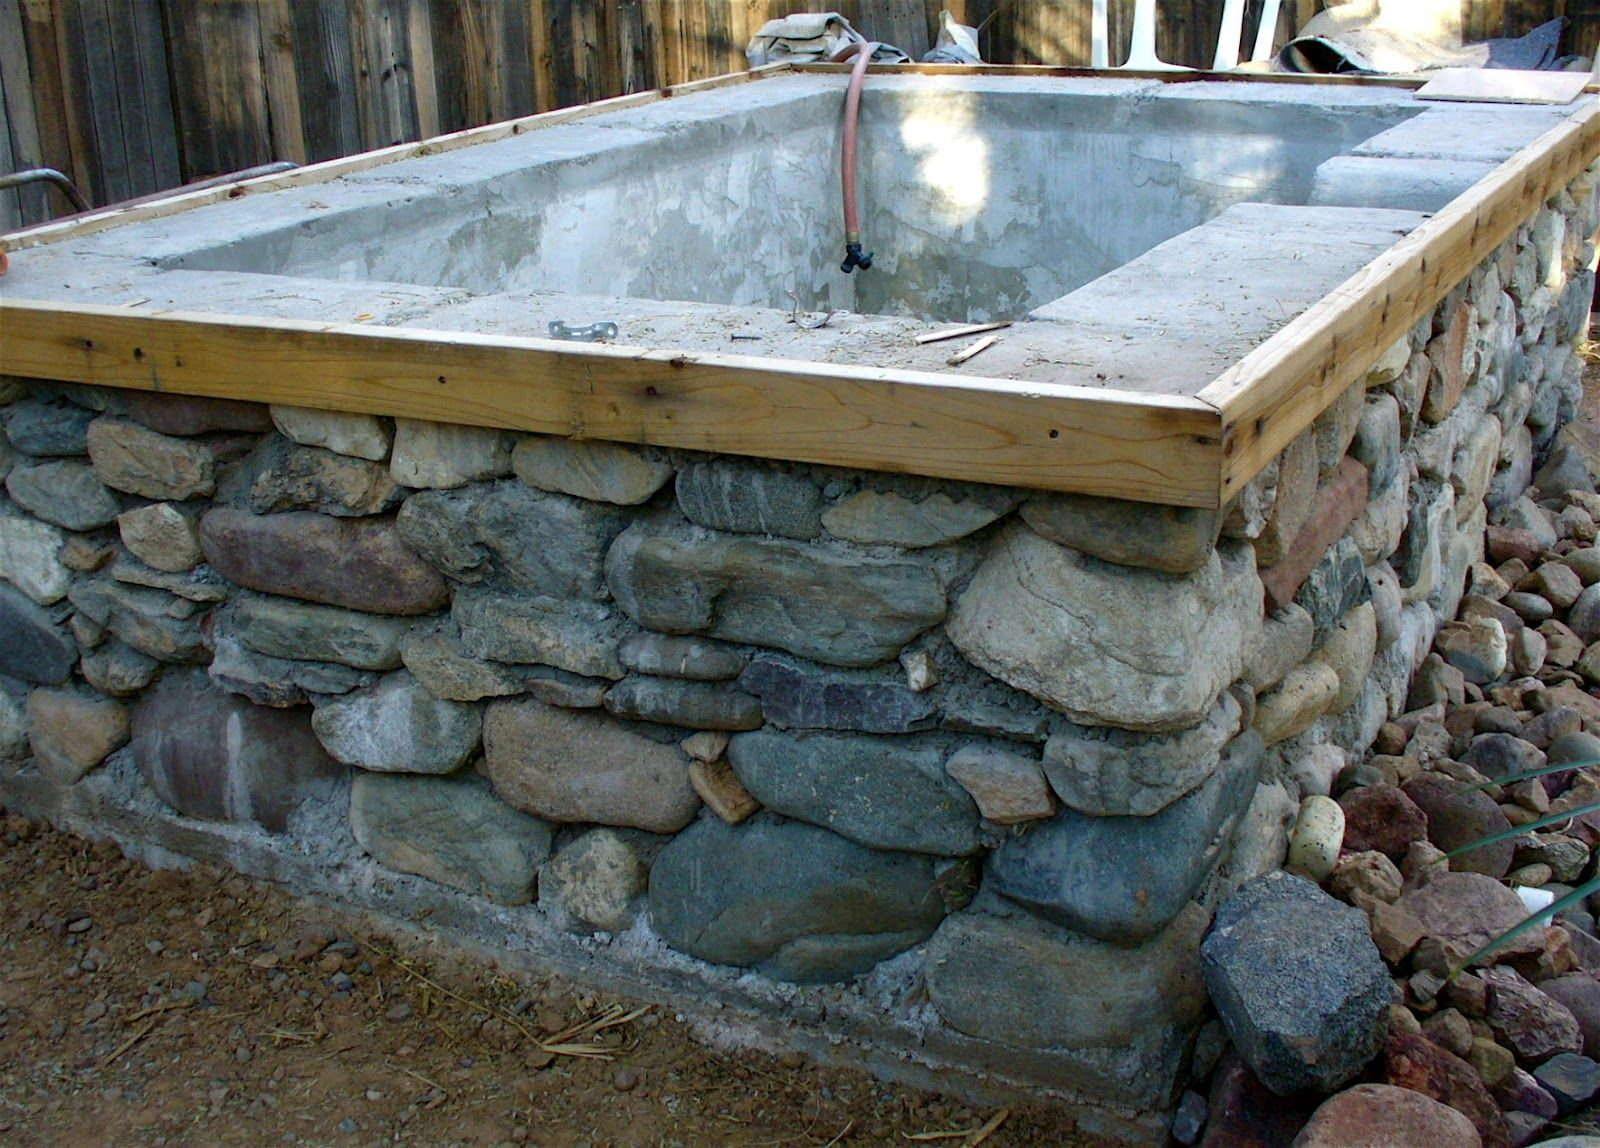 diy outdoor hot tub buscar con google build a home pinterest alte badewanne badewannen. Black Bedroom Furniture Sets. Home Design Ideas